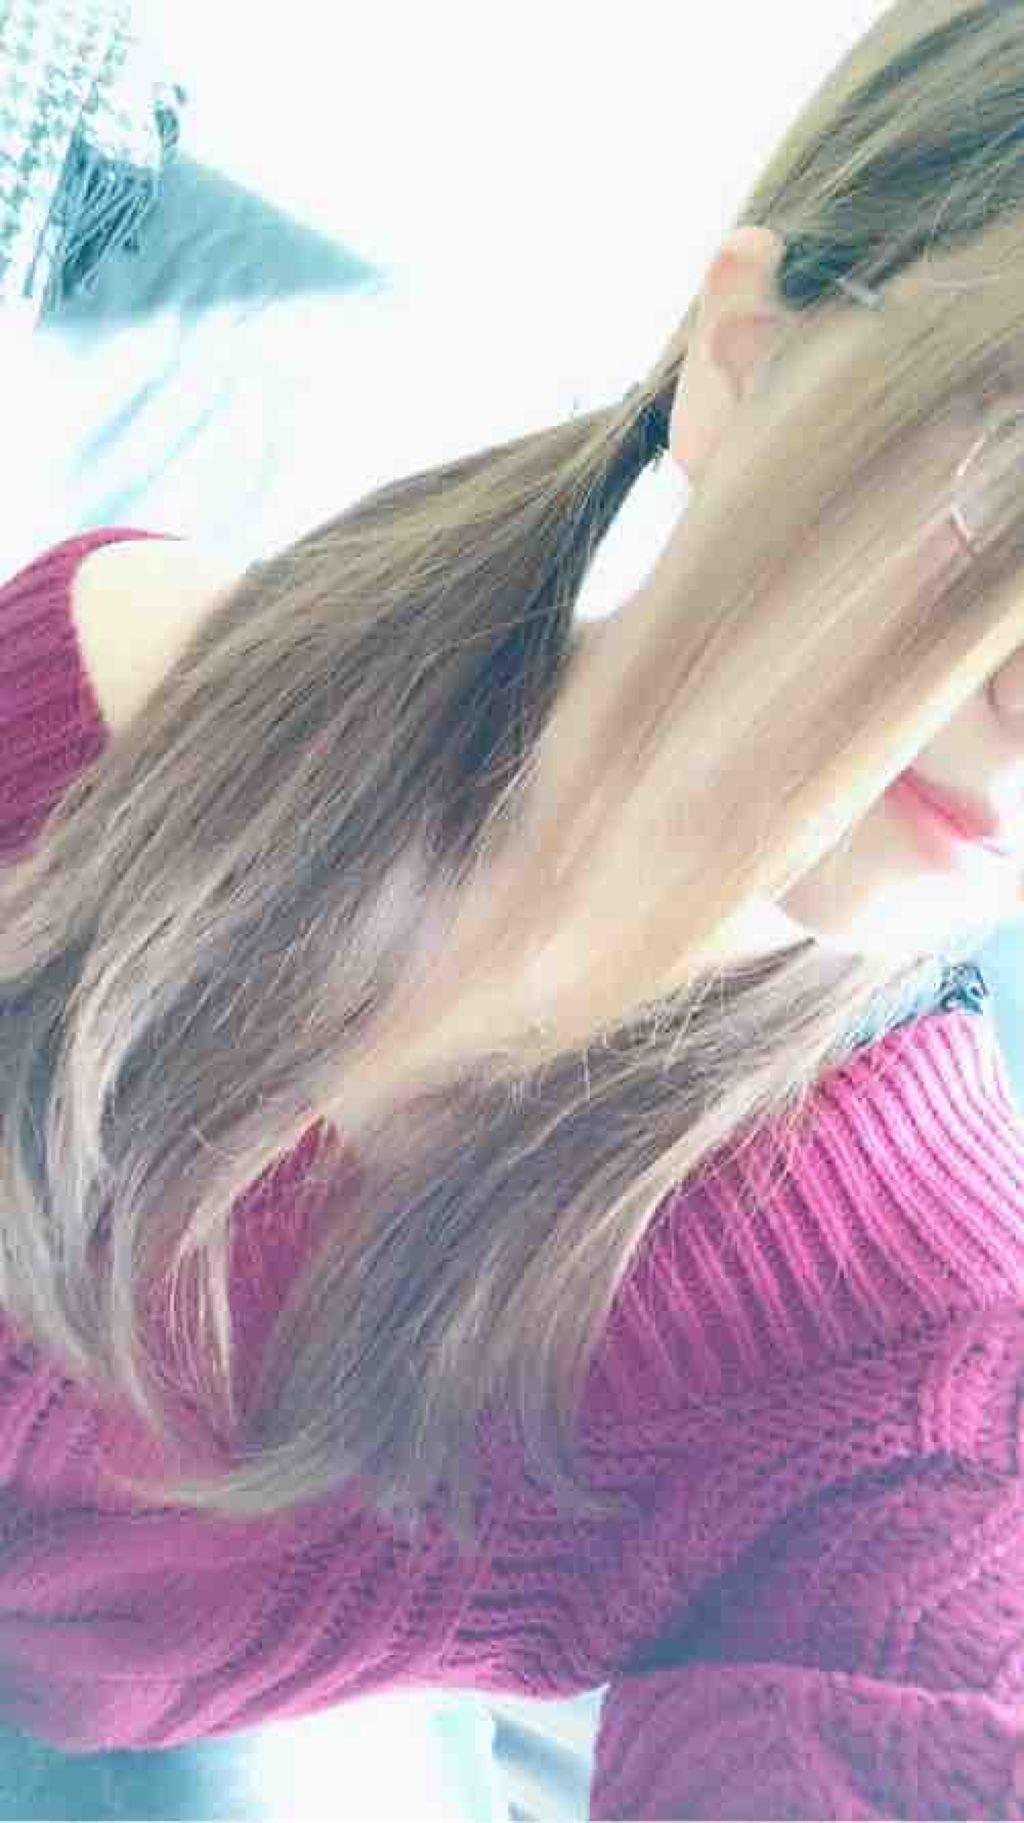 shinon(´・ω・`)♡